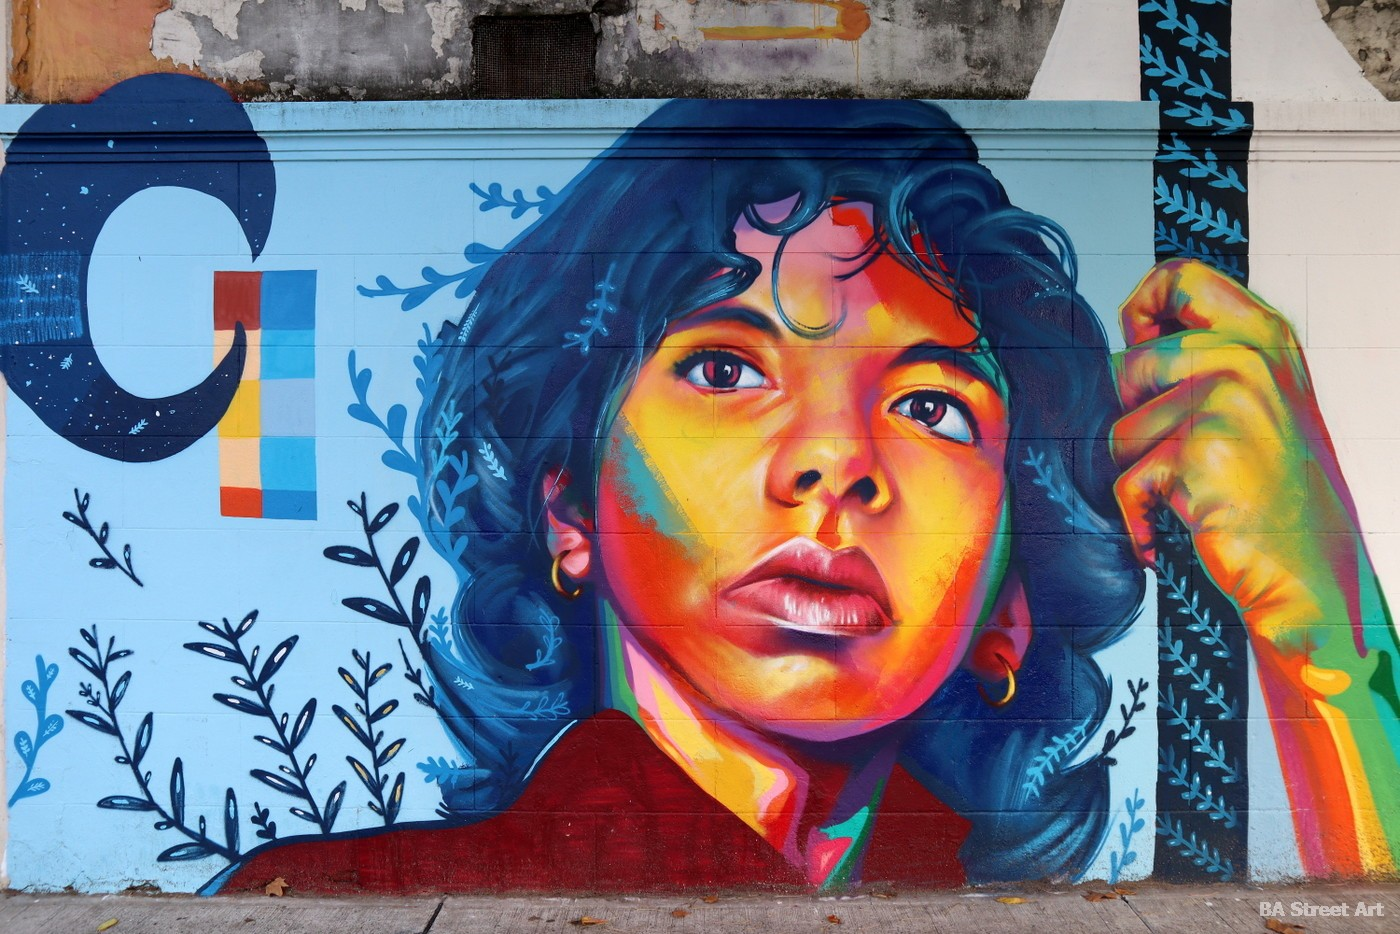 palermo street art tour buenos aires thomas evans detour arte urbano buenosairesstreetart.com.jpg